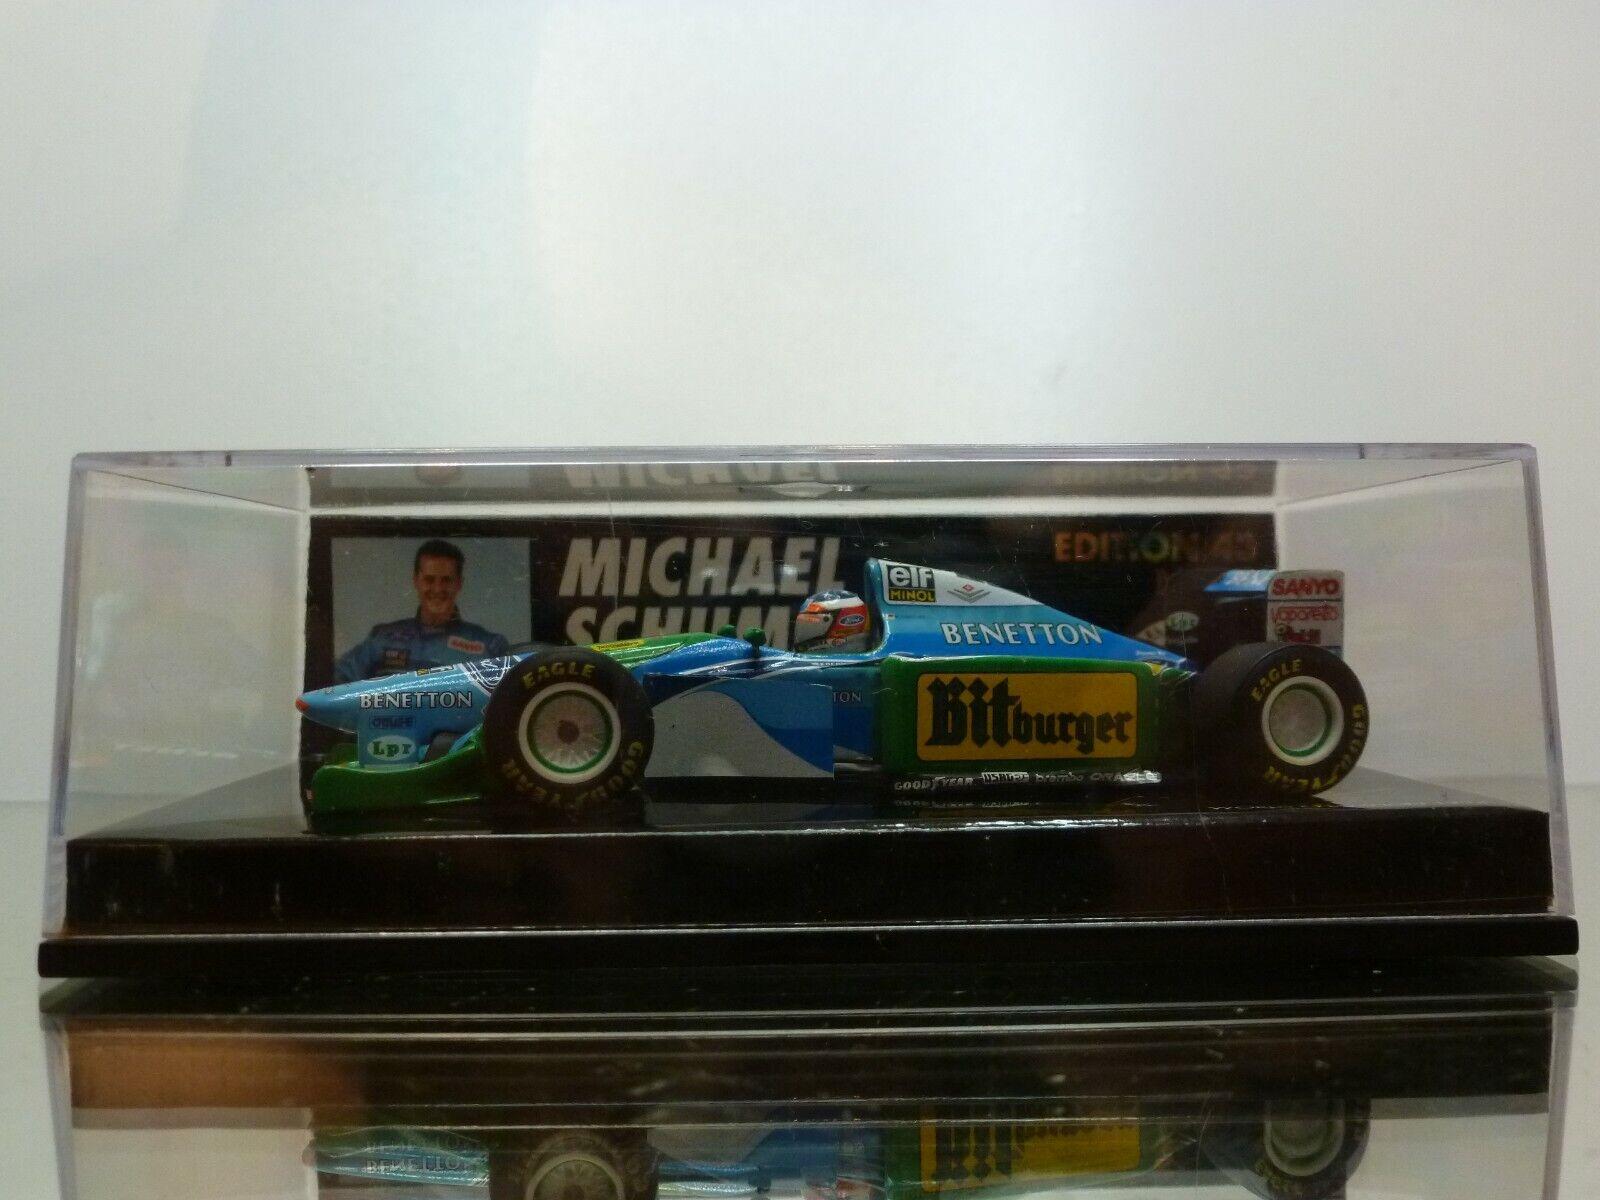 negozio outlet MINICHAMPS 944335 BENETTON FORD B194 B194 B194 SCHUMACHER - 1 43 - EXCELLENT IN scatola  caldo